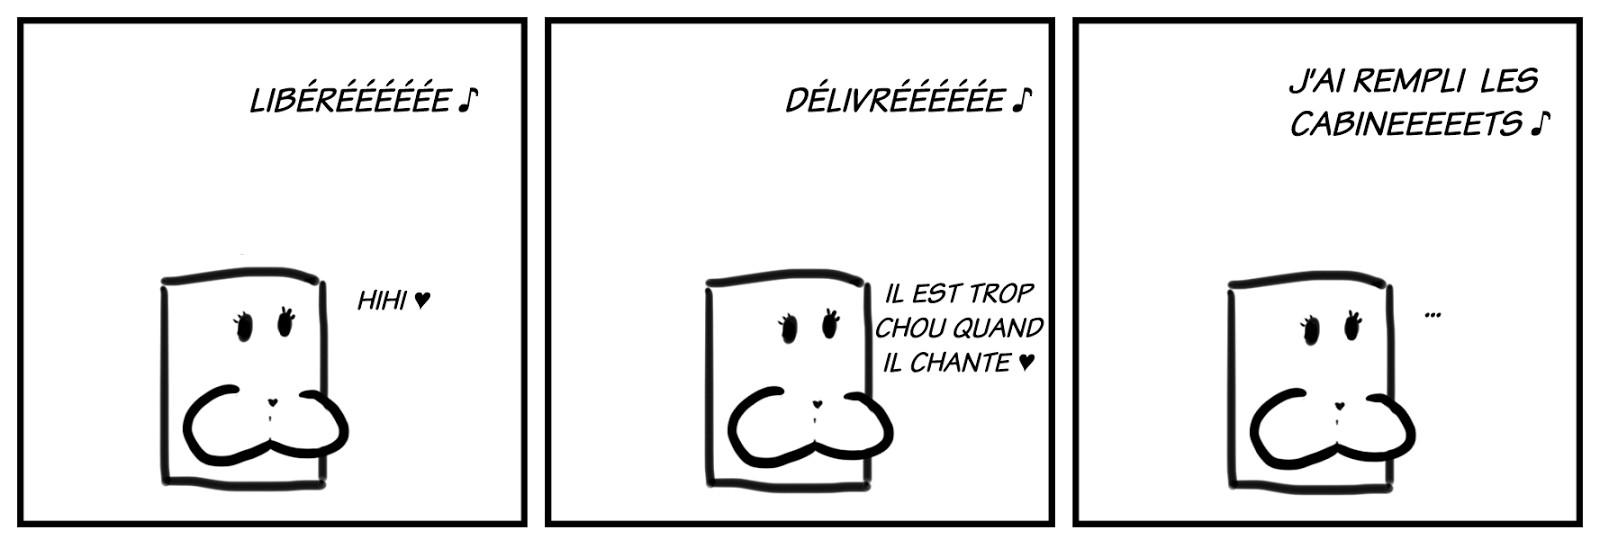 Cabinets - meme